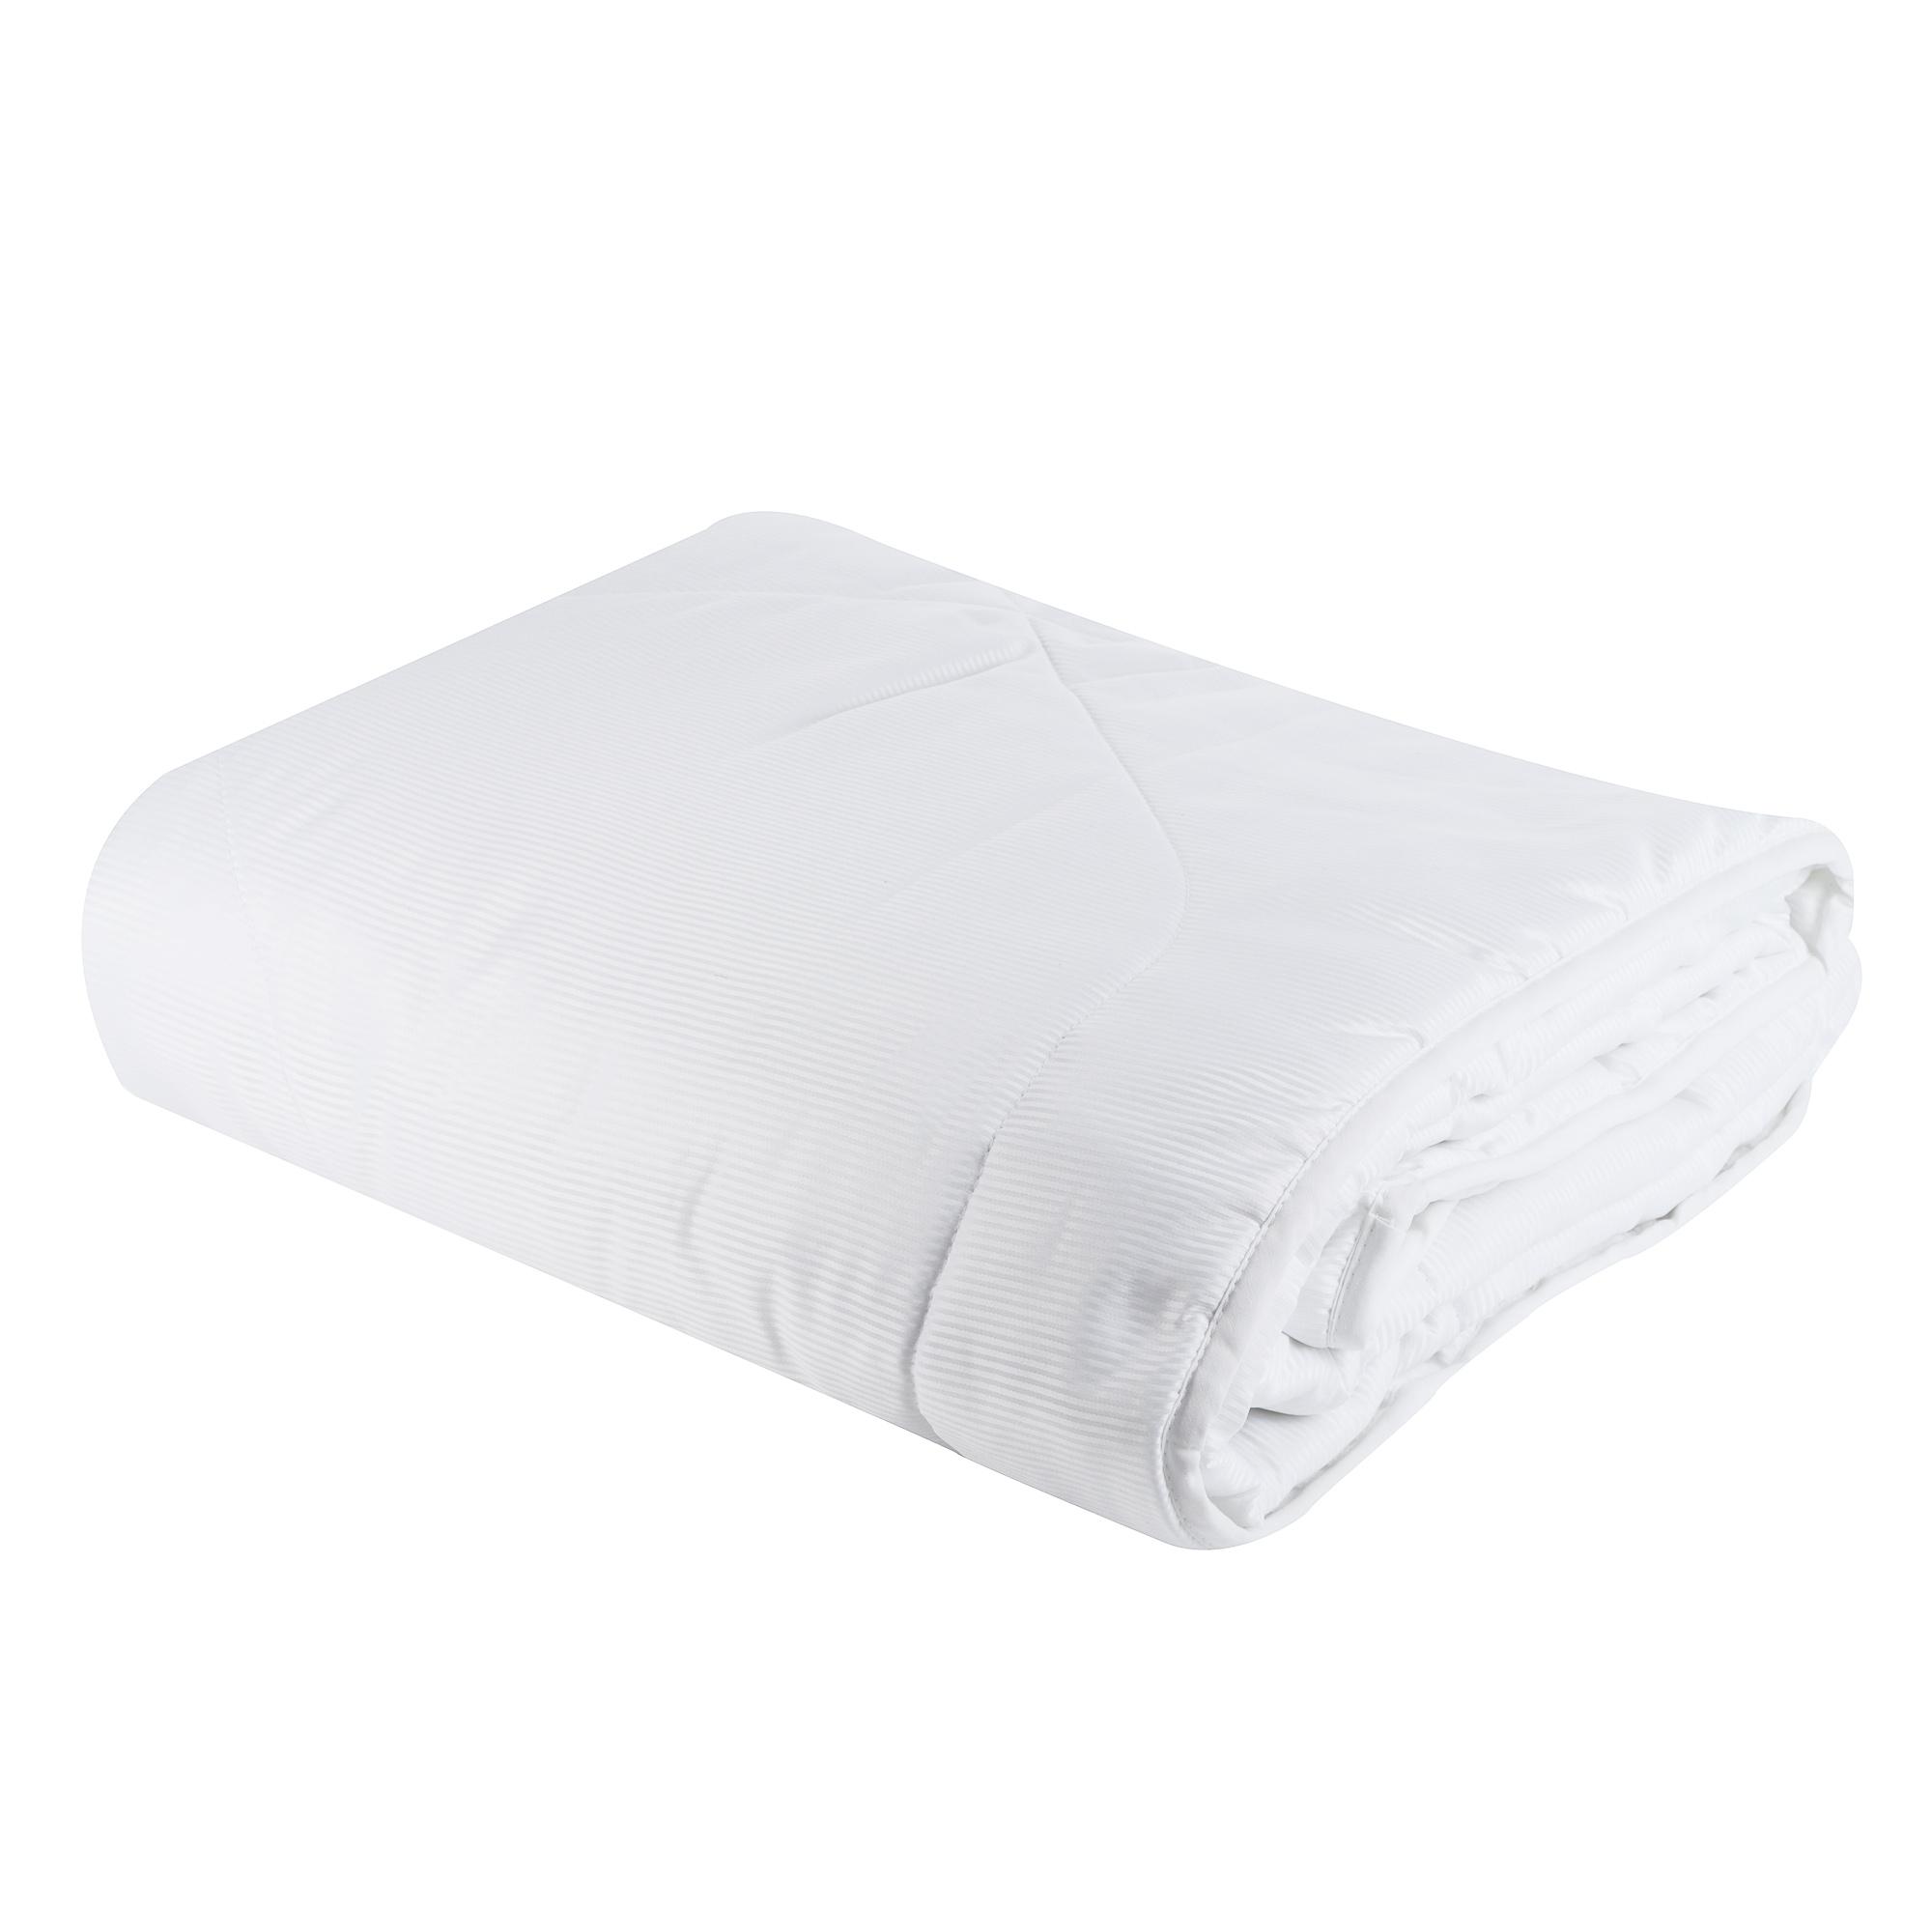 Одеяло estia wool dreams 175х200 см lili dreams одеяло демисезонное lili dreams космос разноцветный